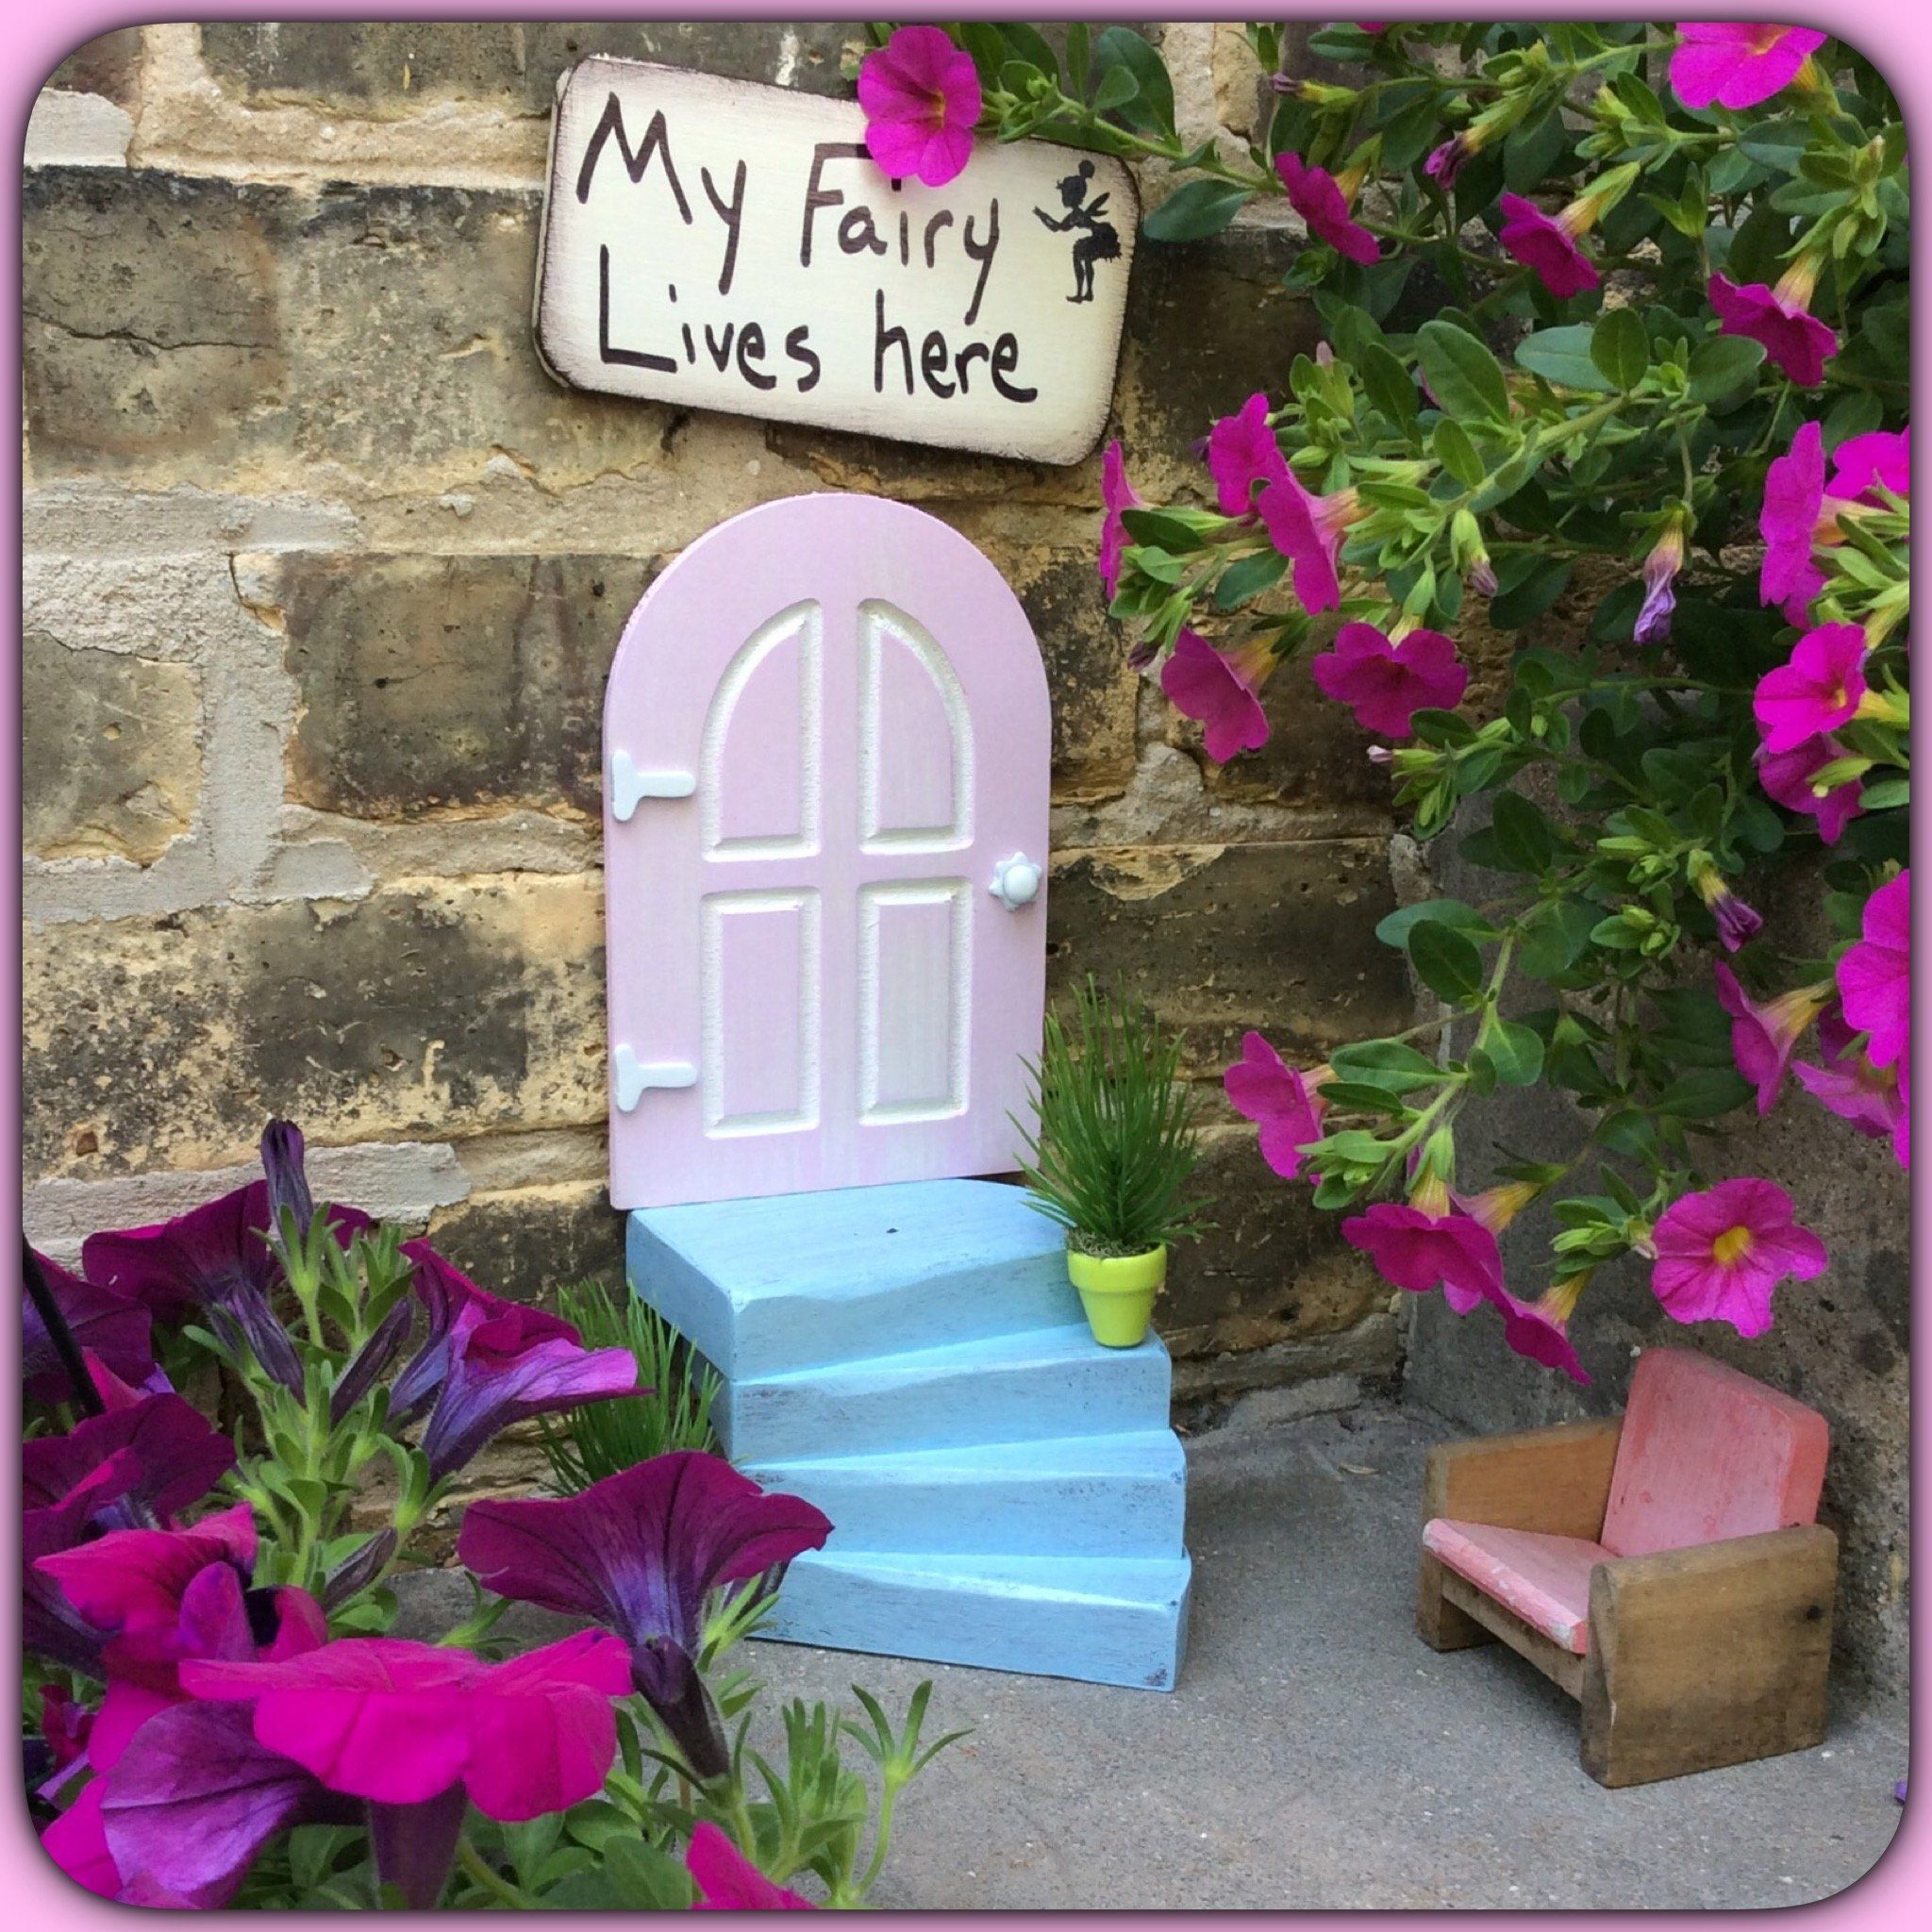 Merveilleux Pink Fairy Door, Garden Decor, Fairy Garden, Gifts For Her, Birthday,  HANDMADE